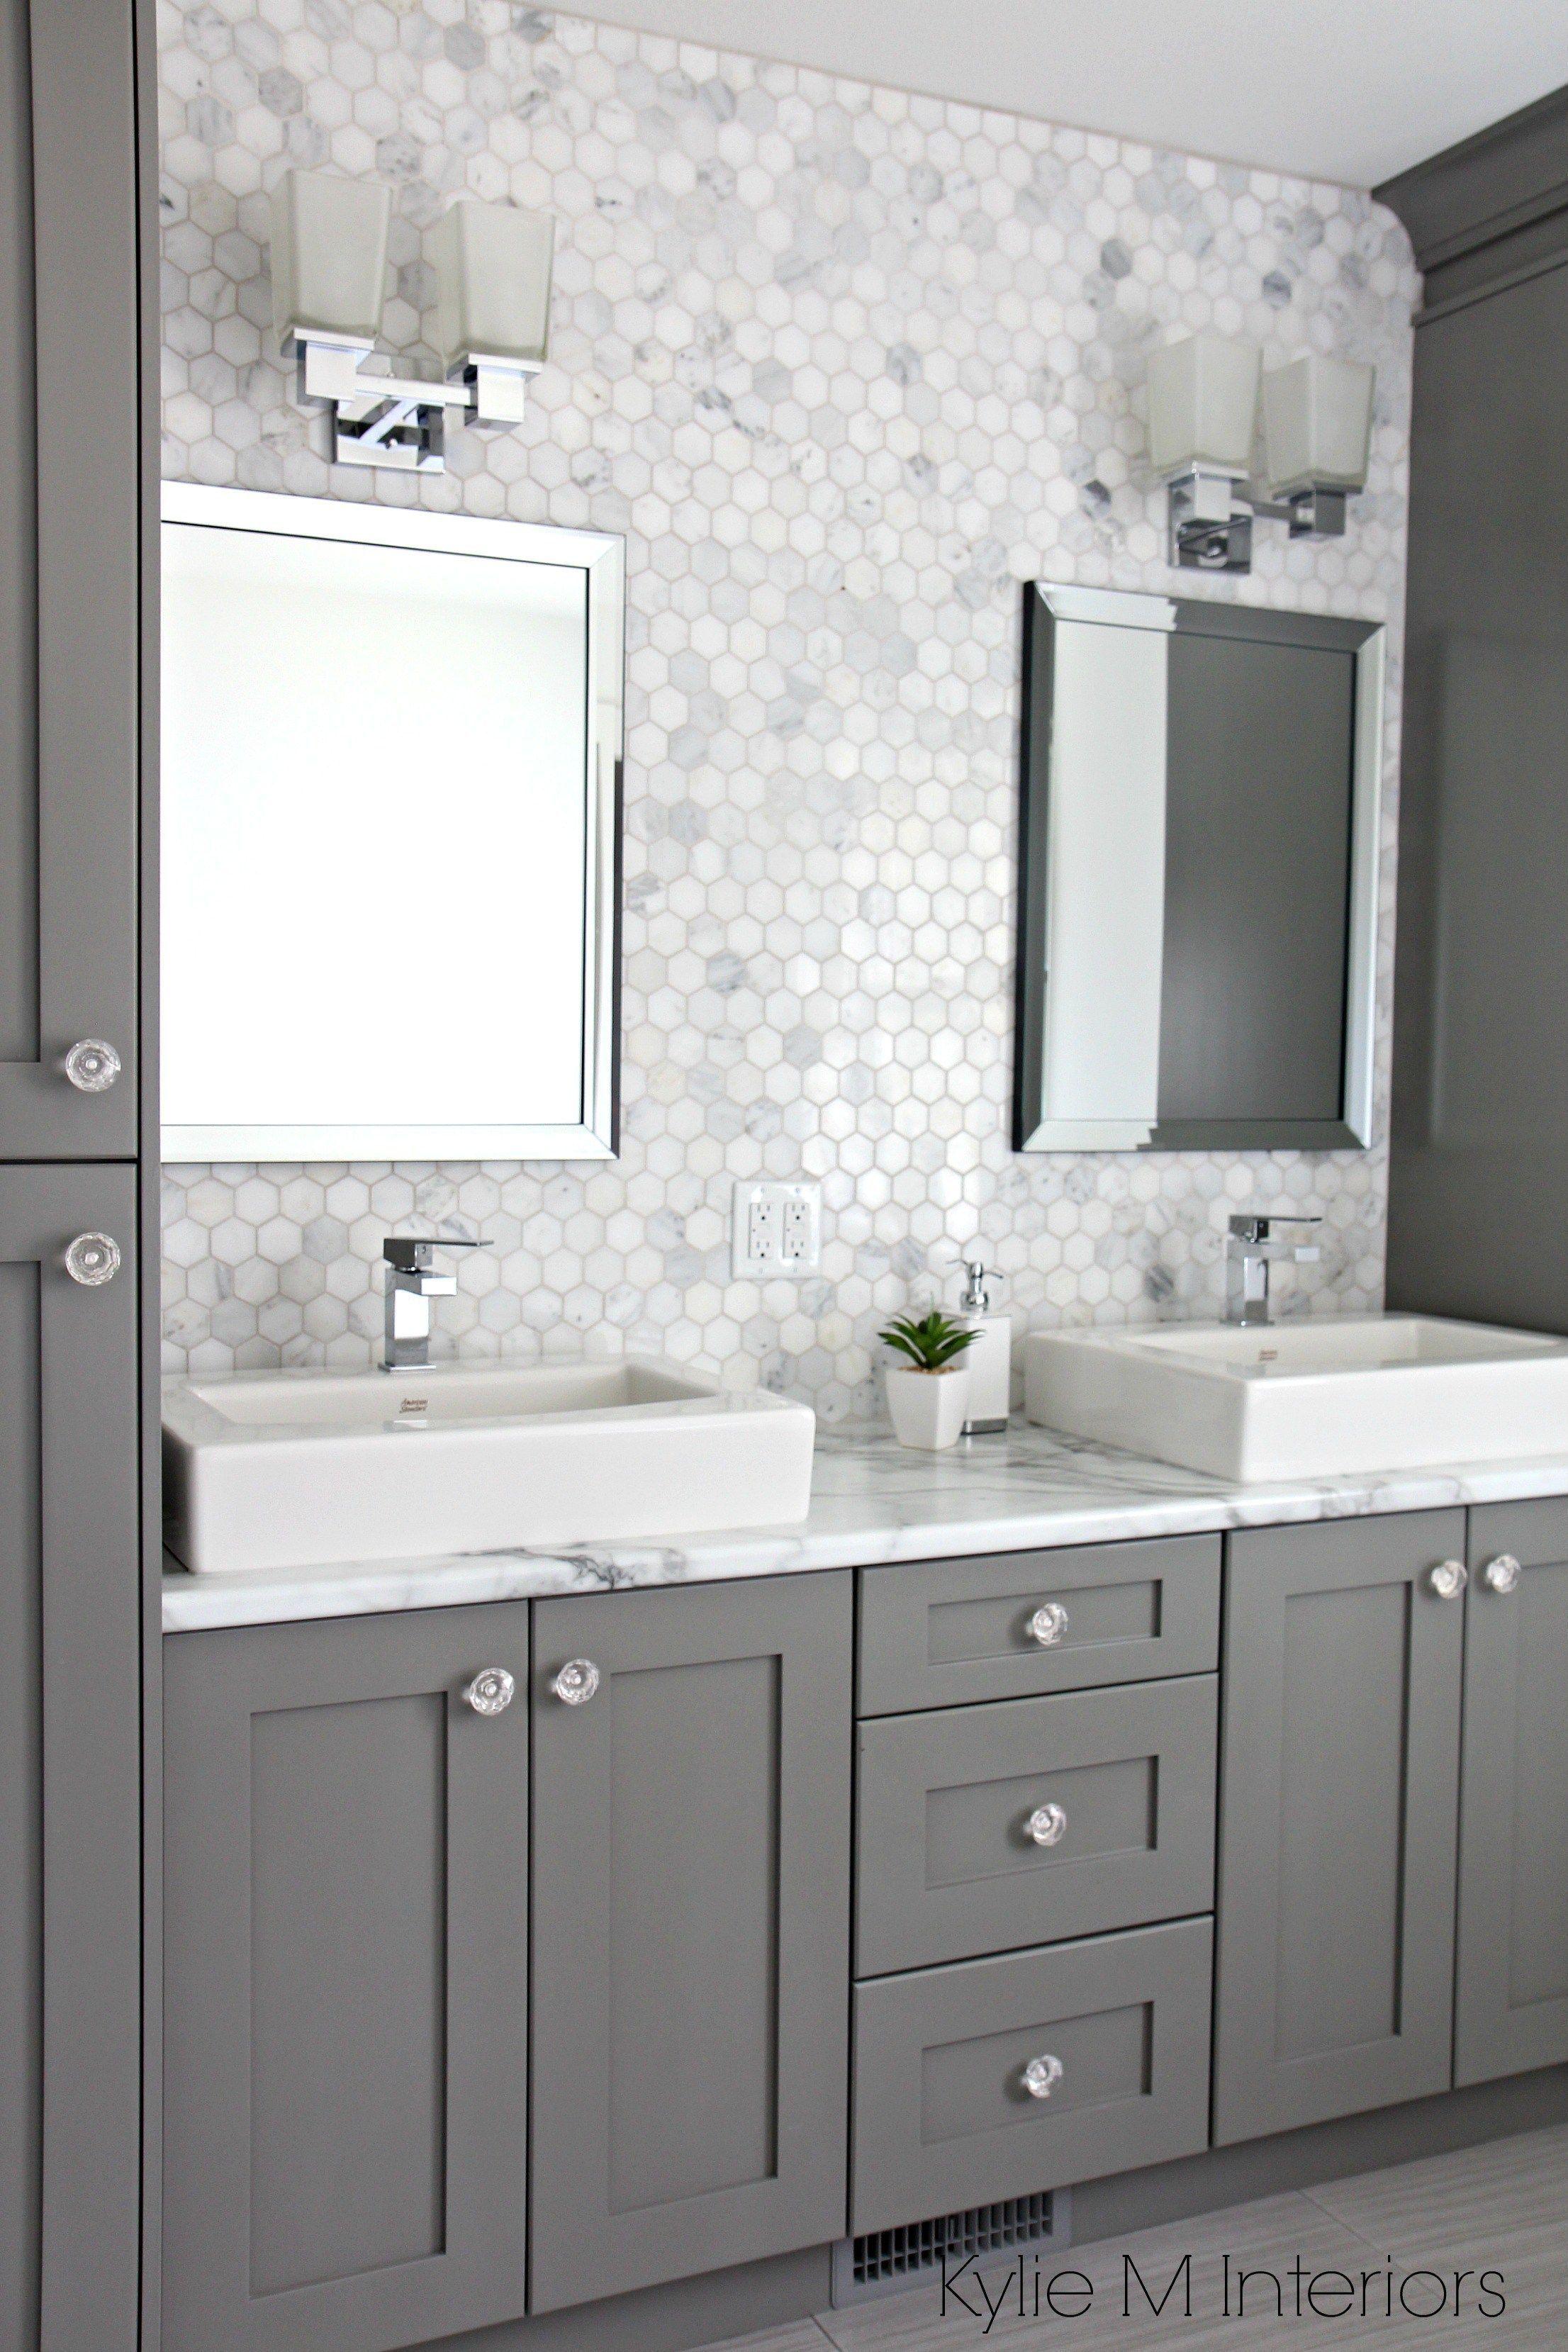 Nice 13 Stylish Ideas How To Upgrade Bathroom Vanity Backsplash